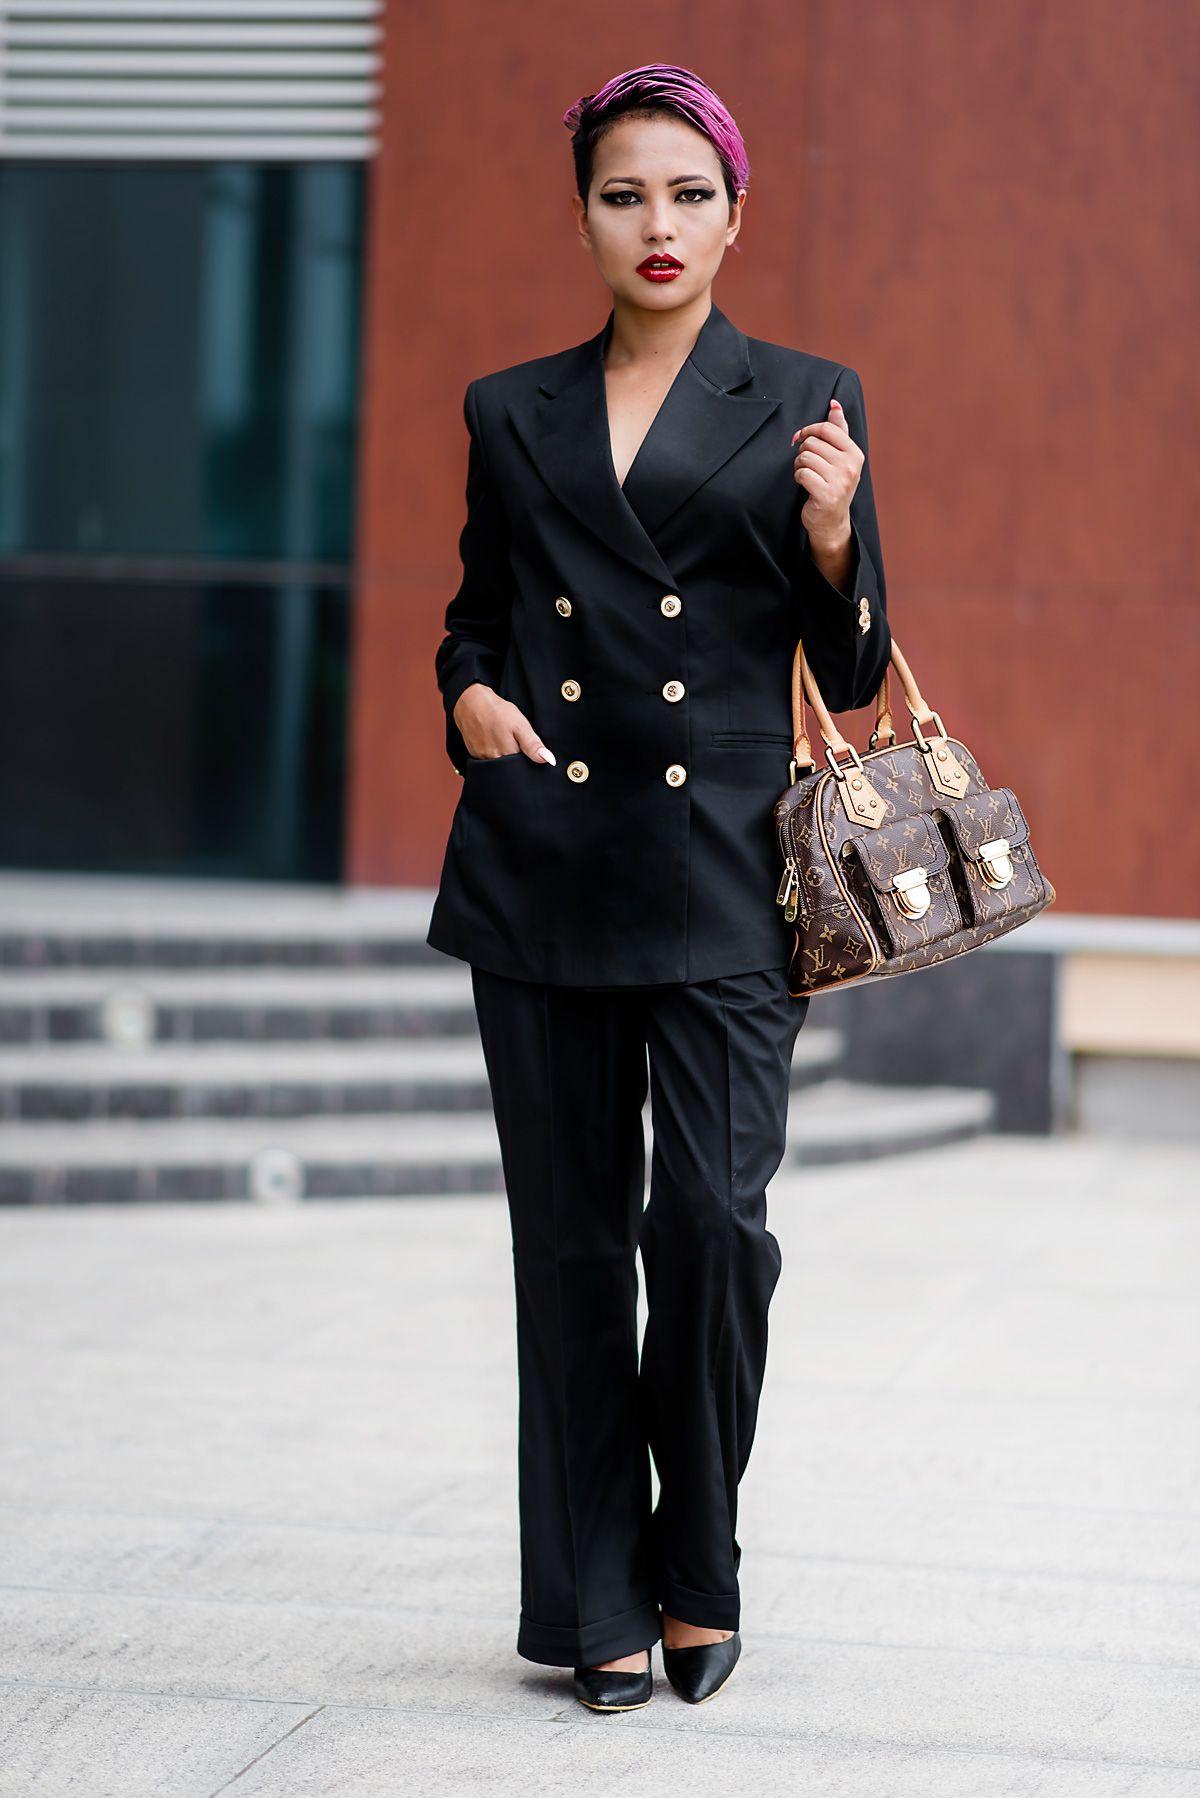 8d346d205f6 Envoged.com - Louis Vuitton Manhattan PM - Indian Fashion Blog - Streetstyle  - Fashion Editorial - 8